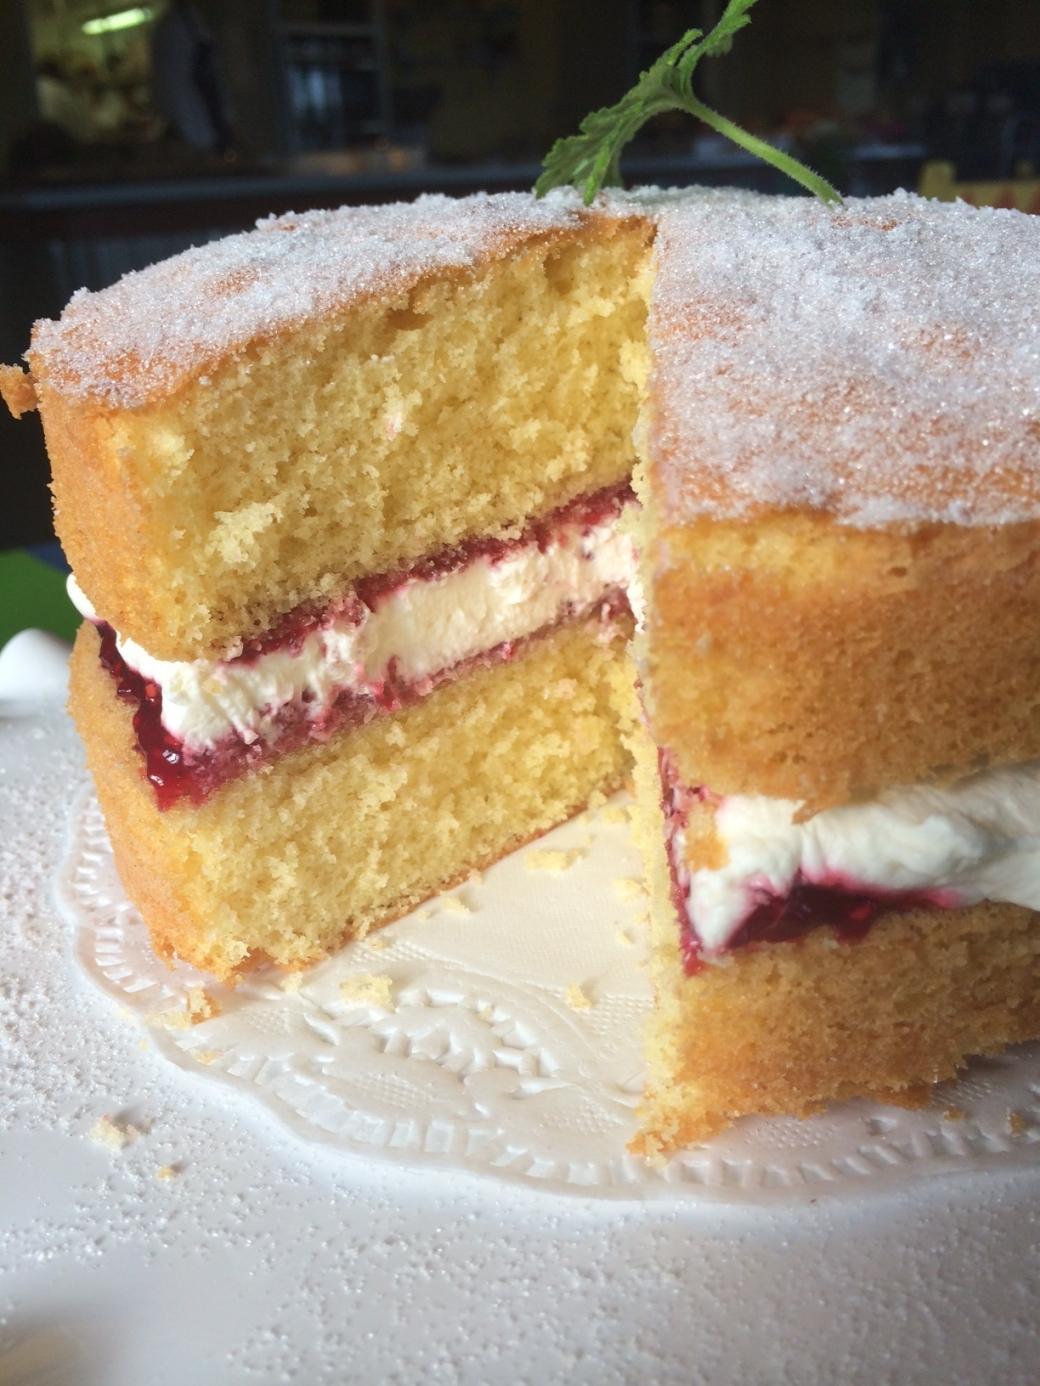 Victoria Sponge Cake at Ballymaloe Cookery School